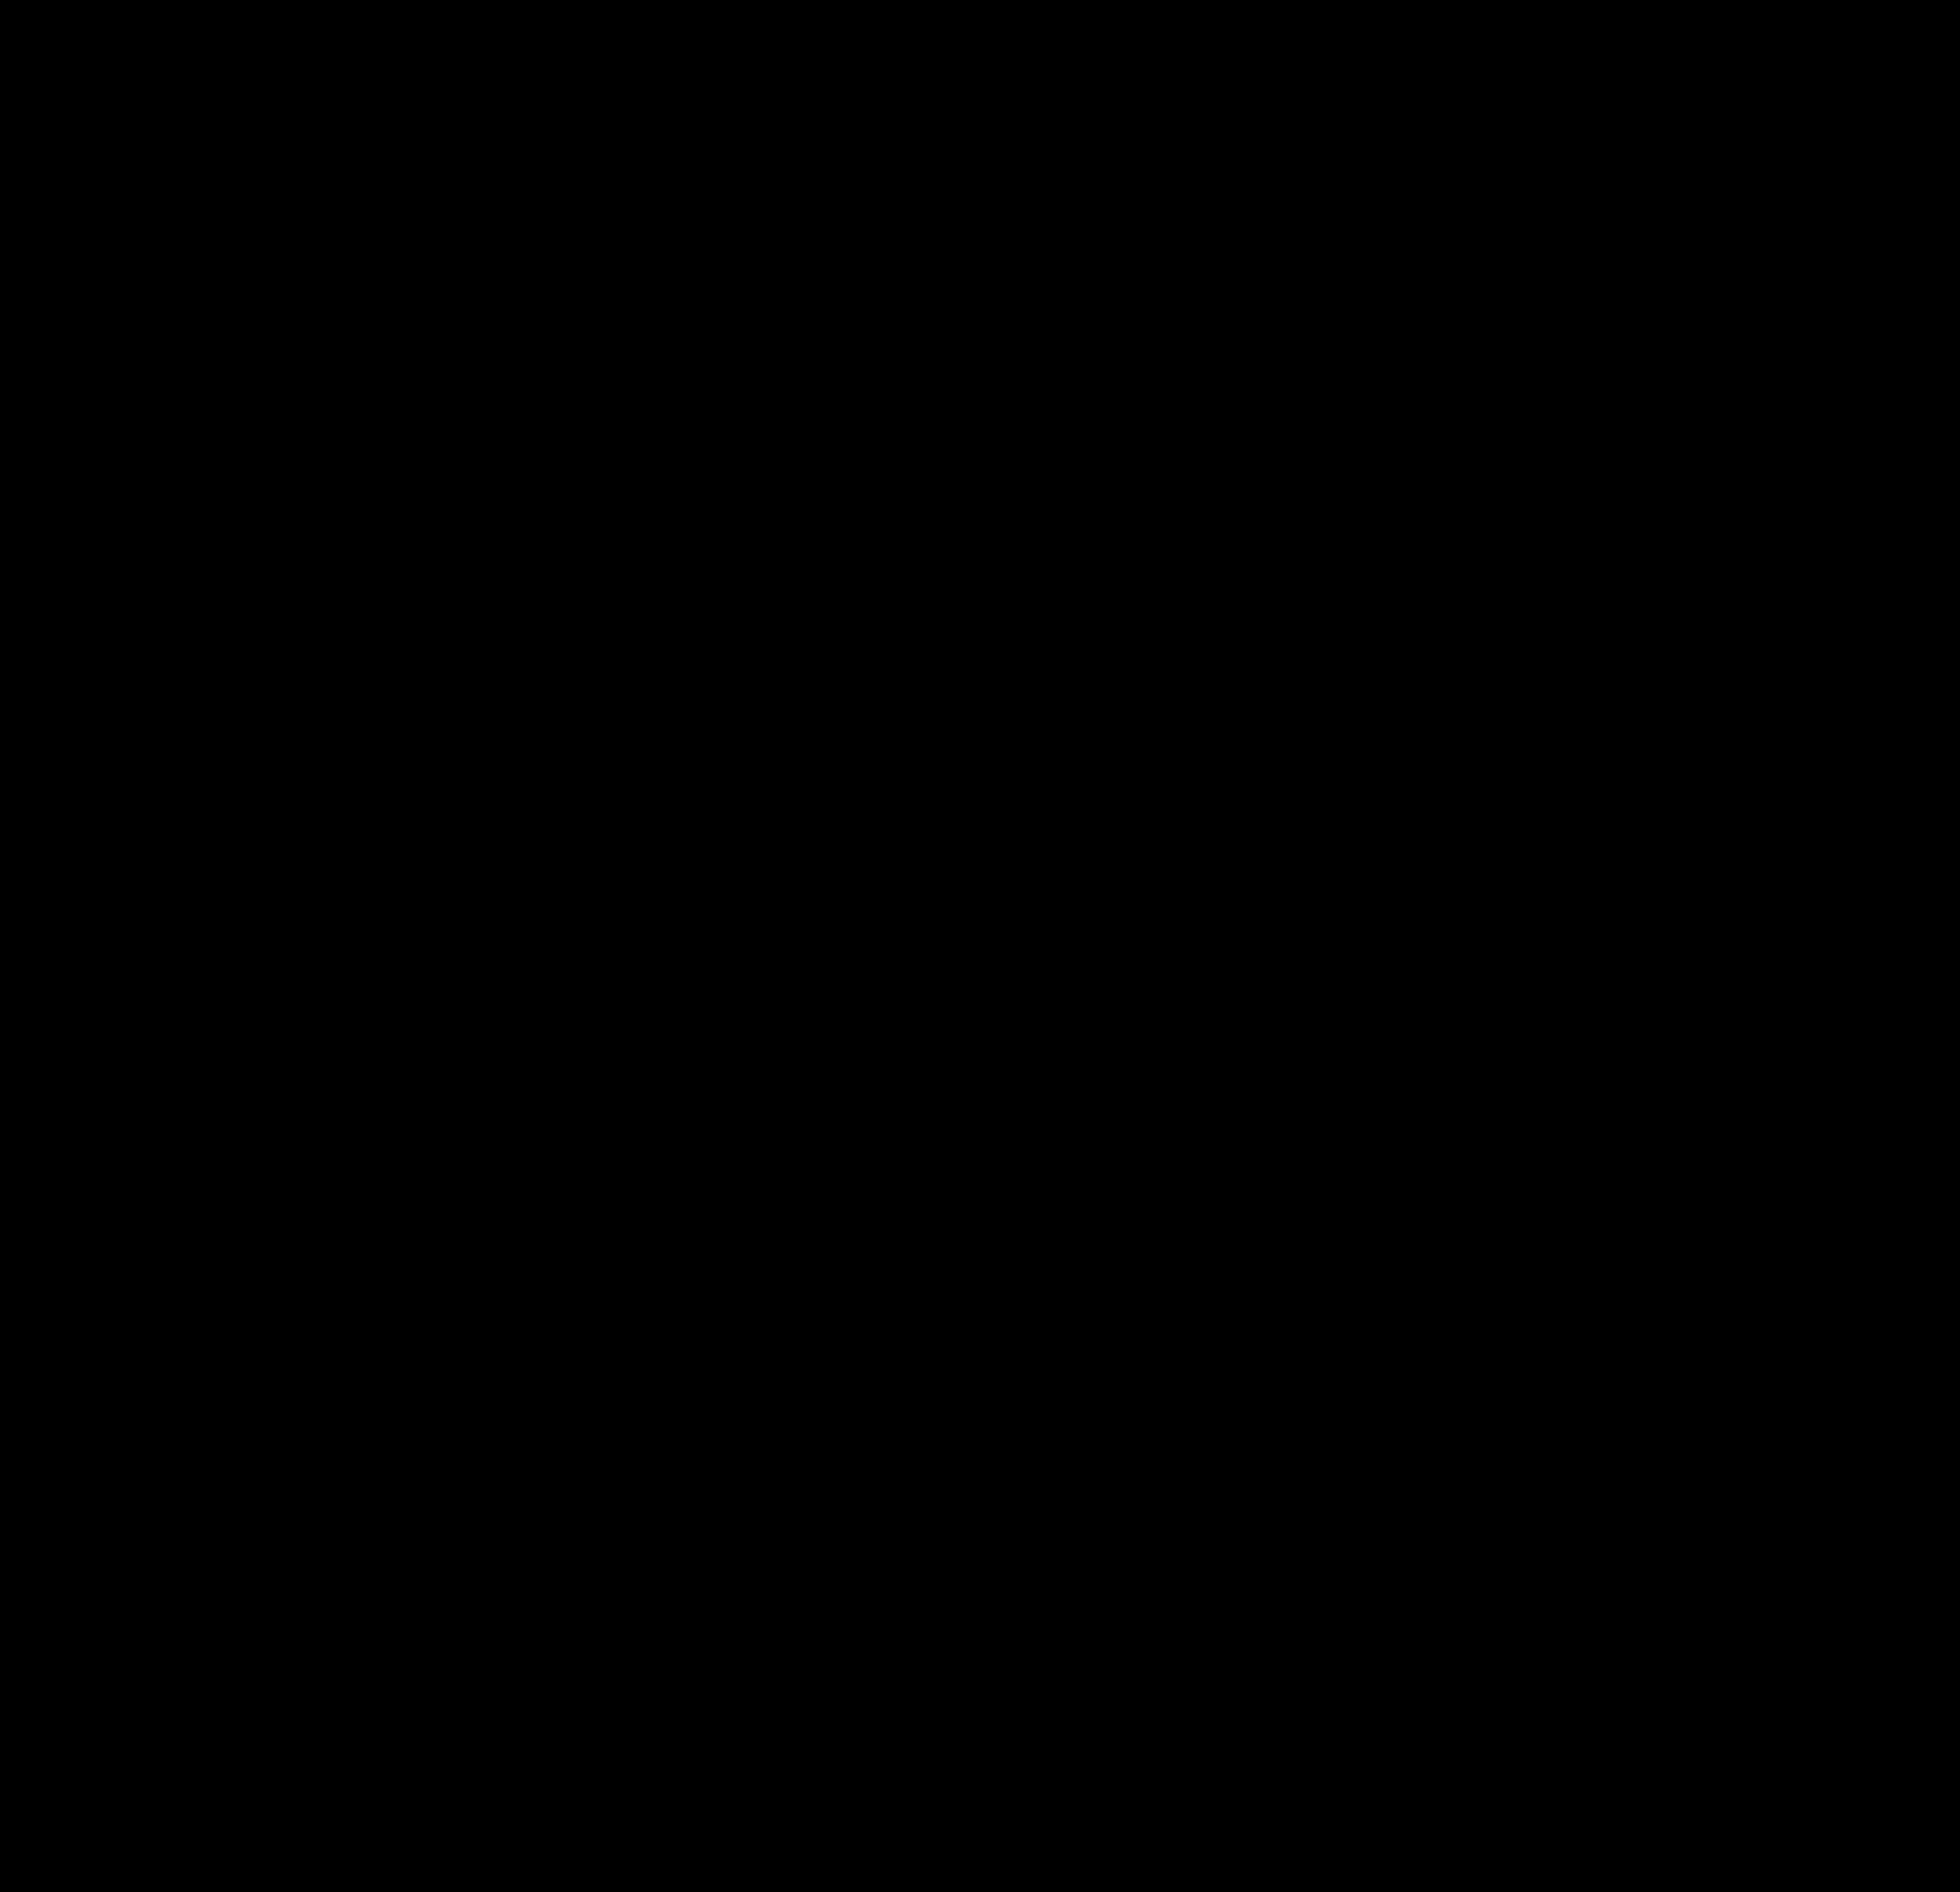 kategraphic